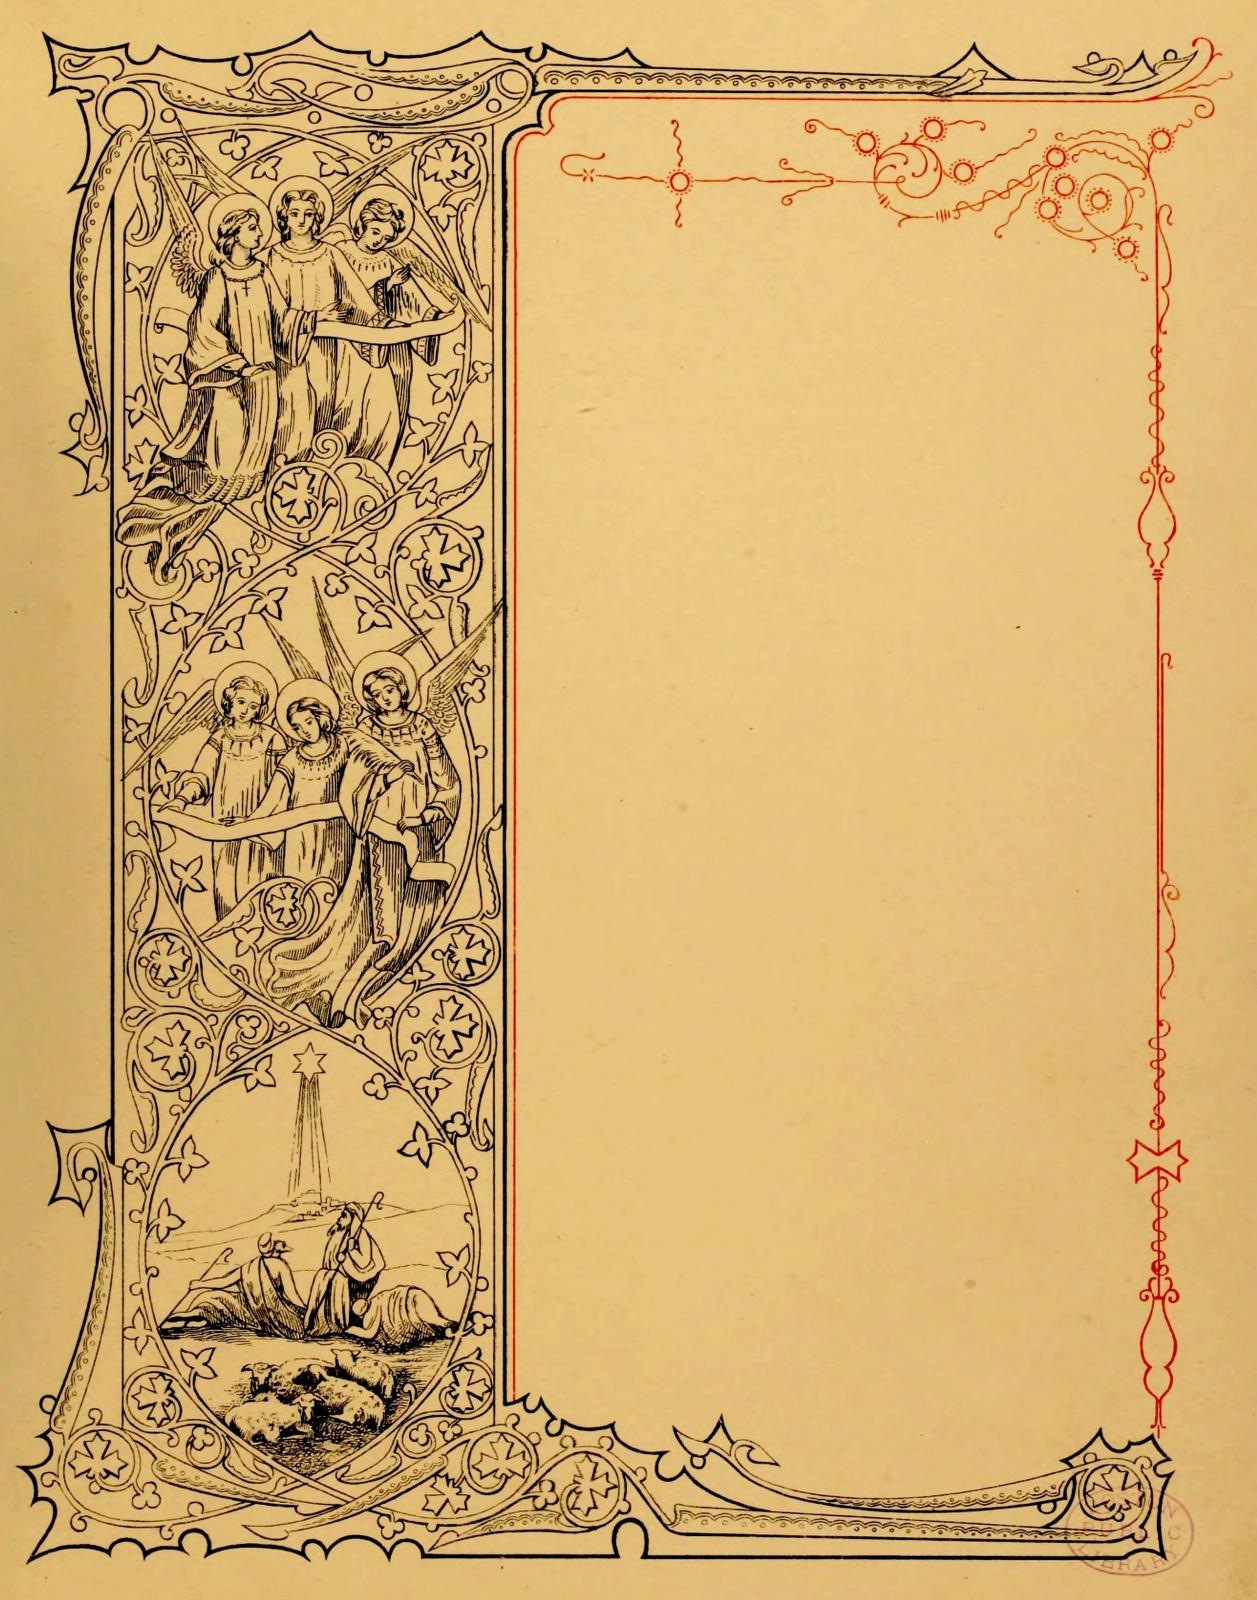 oldenglishcarols00lond_0013 » Best of Public Domain